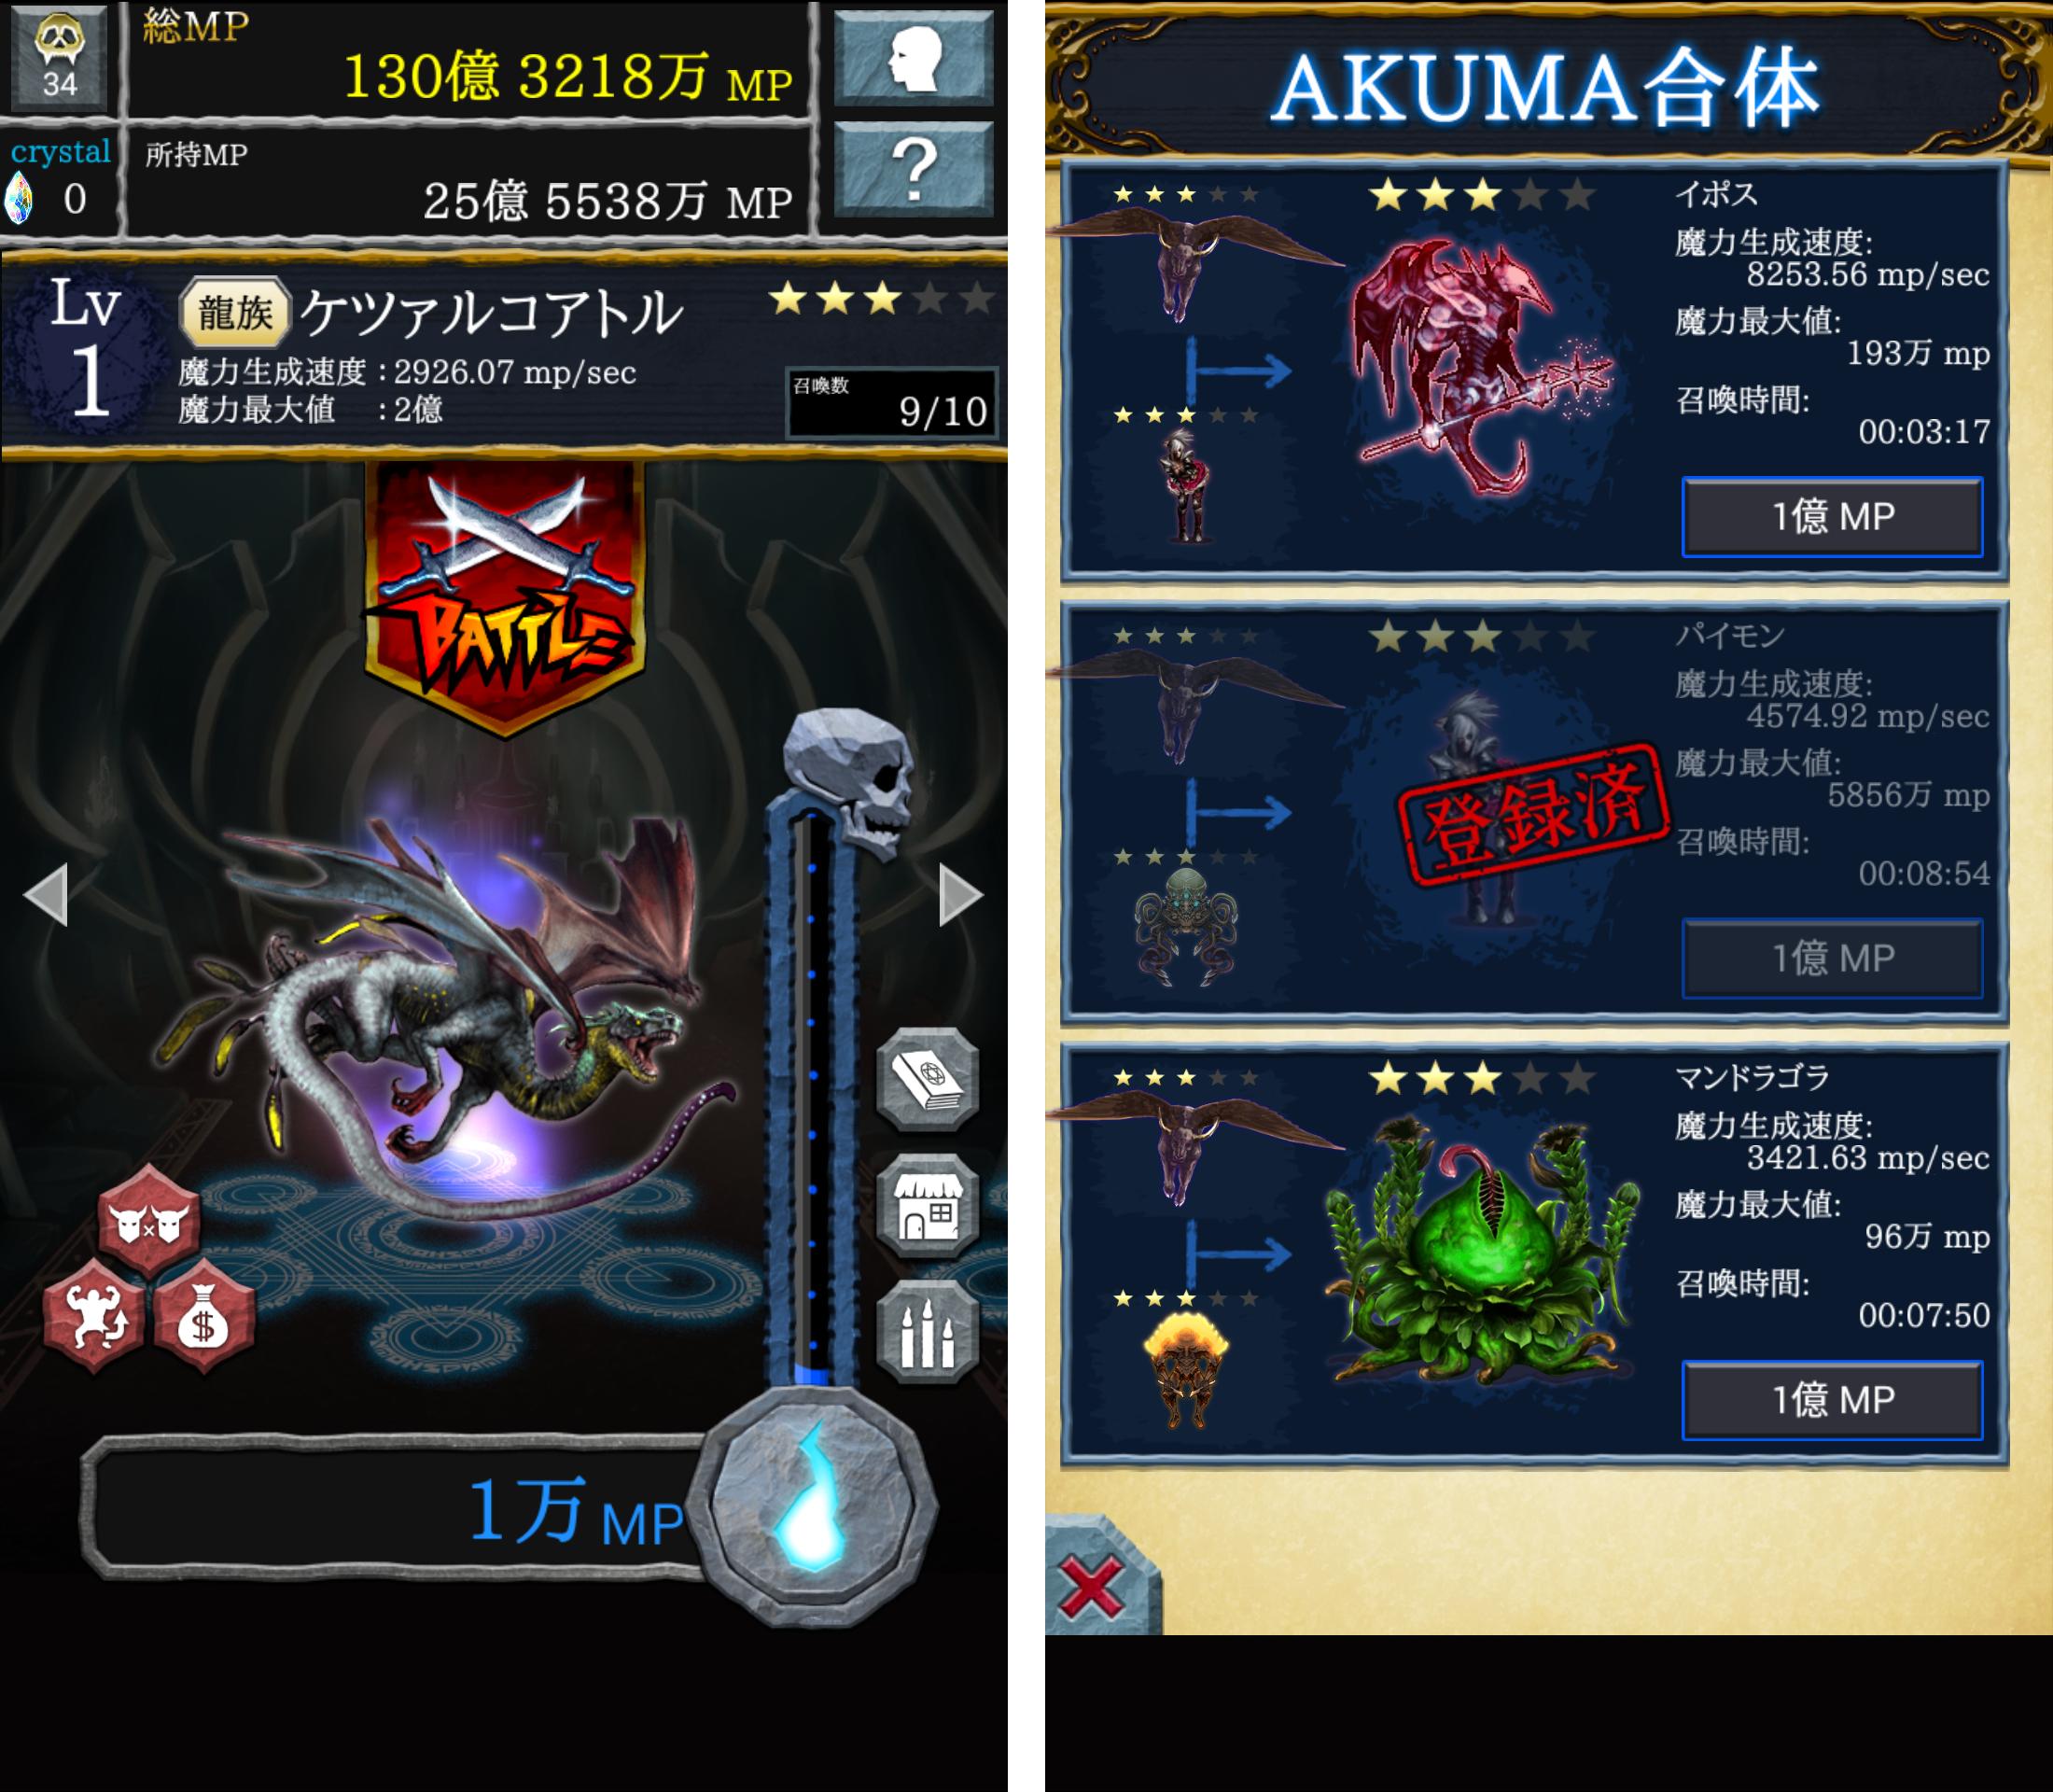 AKUMA大戦 -悪魔合体召喚- androidアプリスクリーンショット1